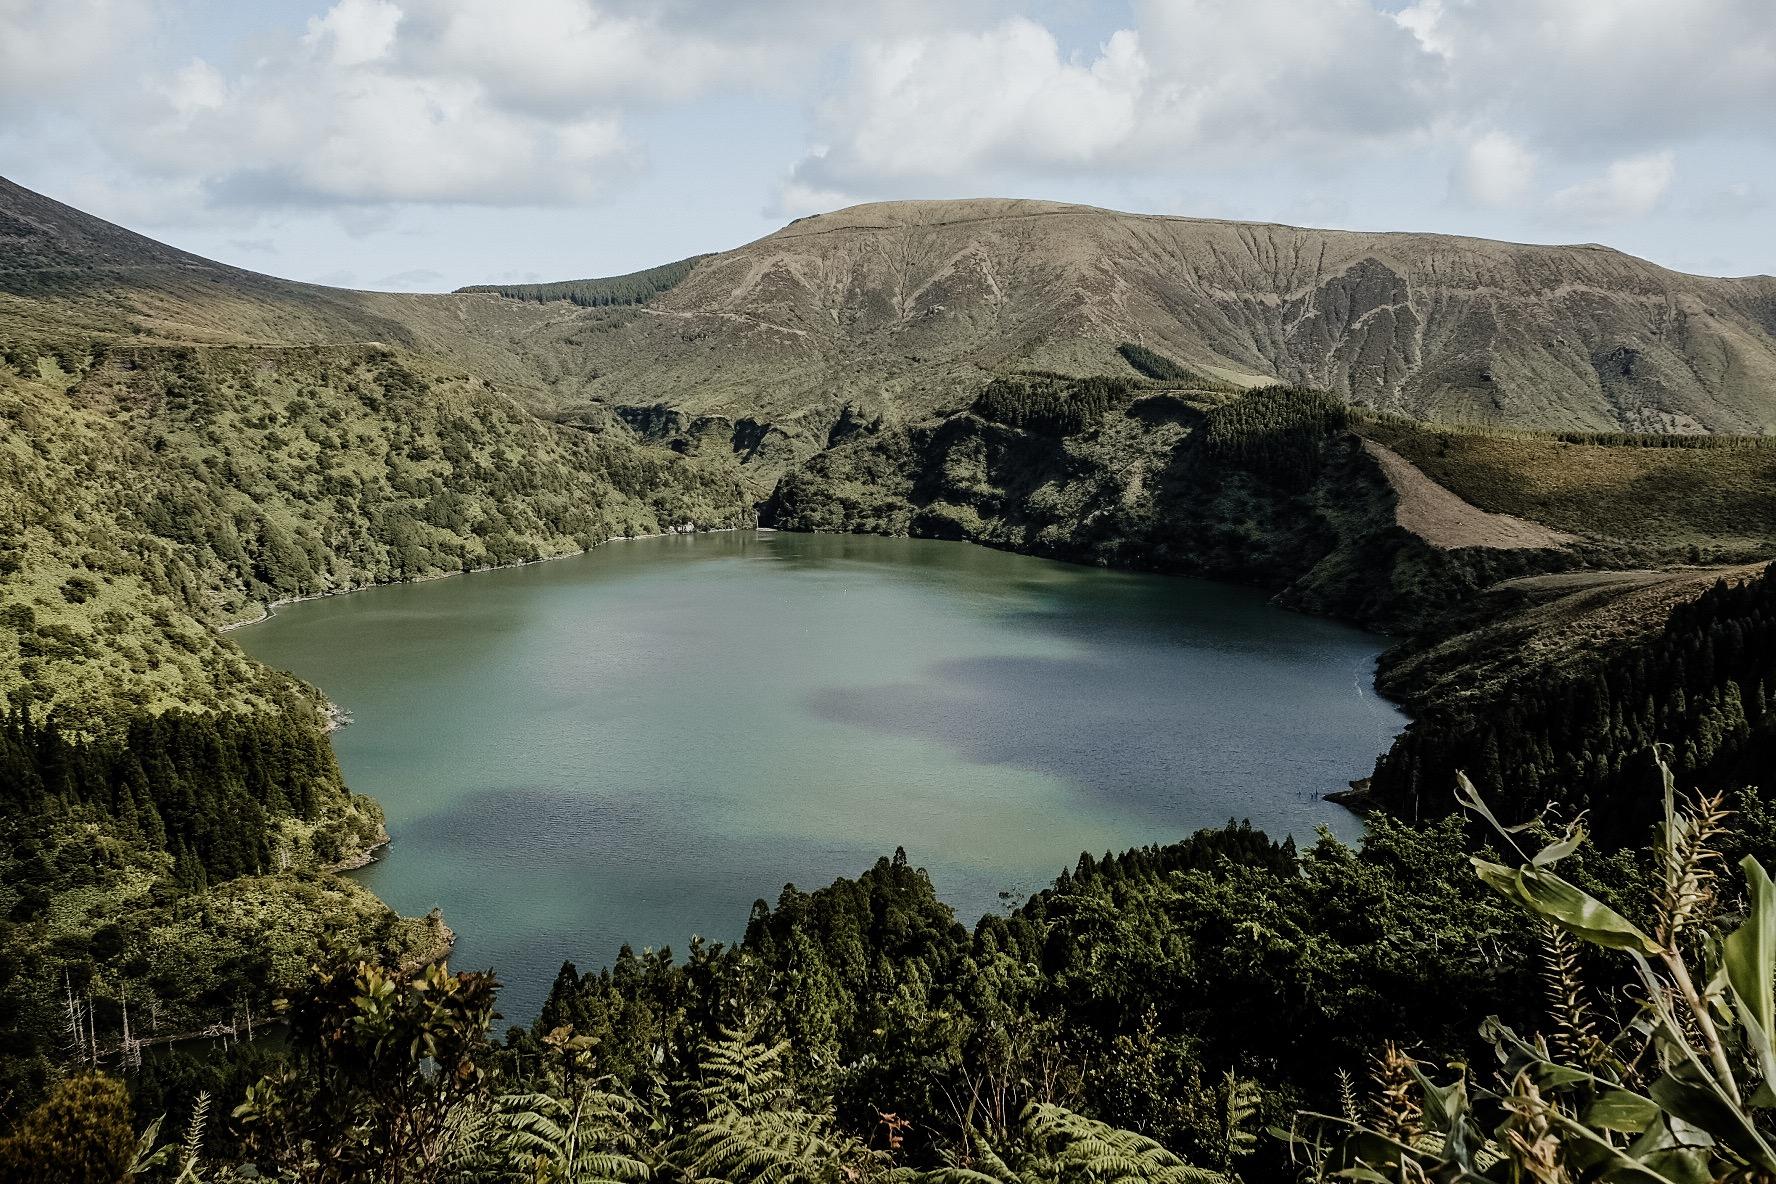 Grün, grüner, Azoren: Inselhopping im Atlantik